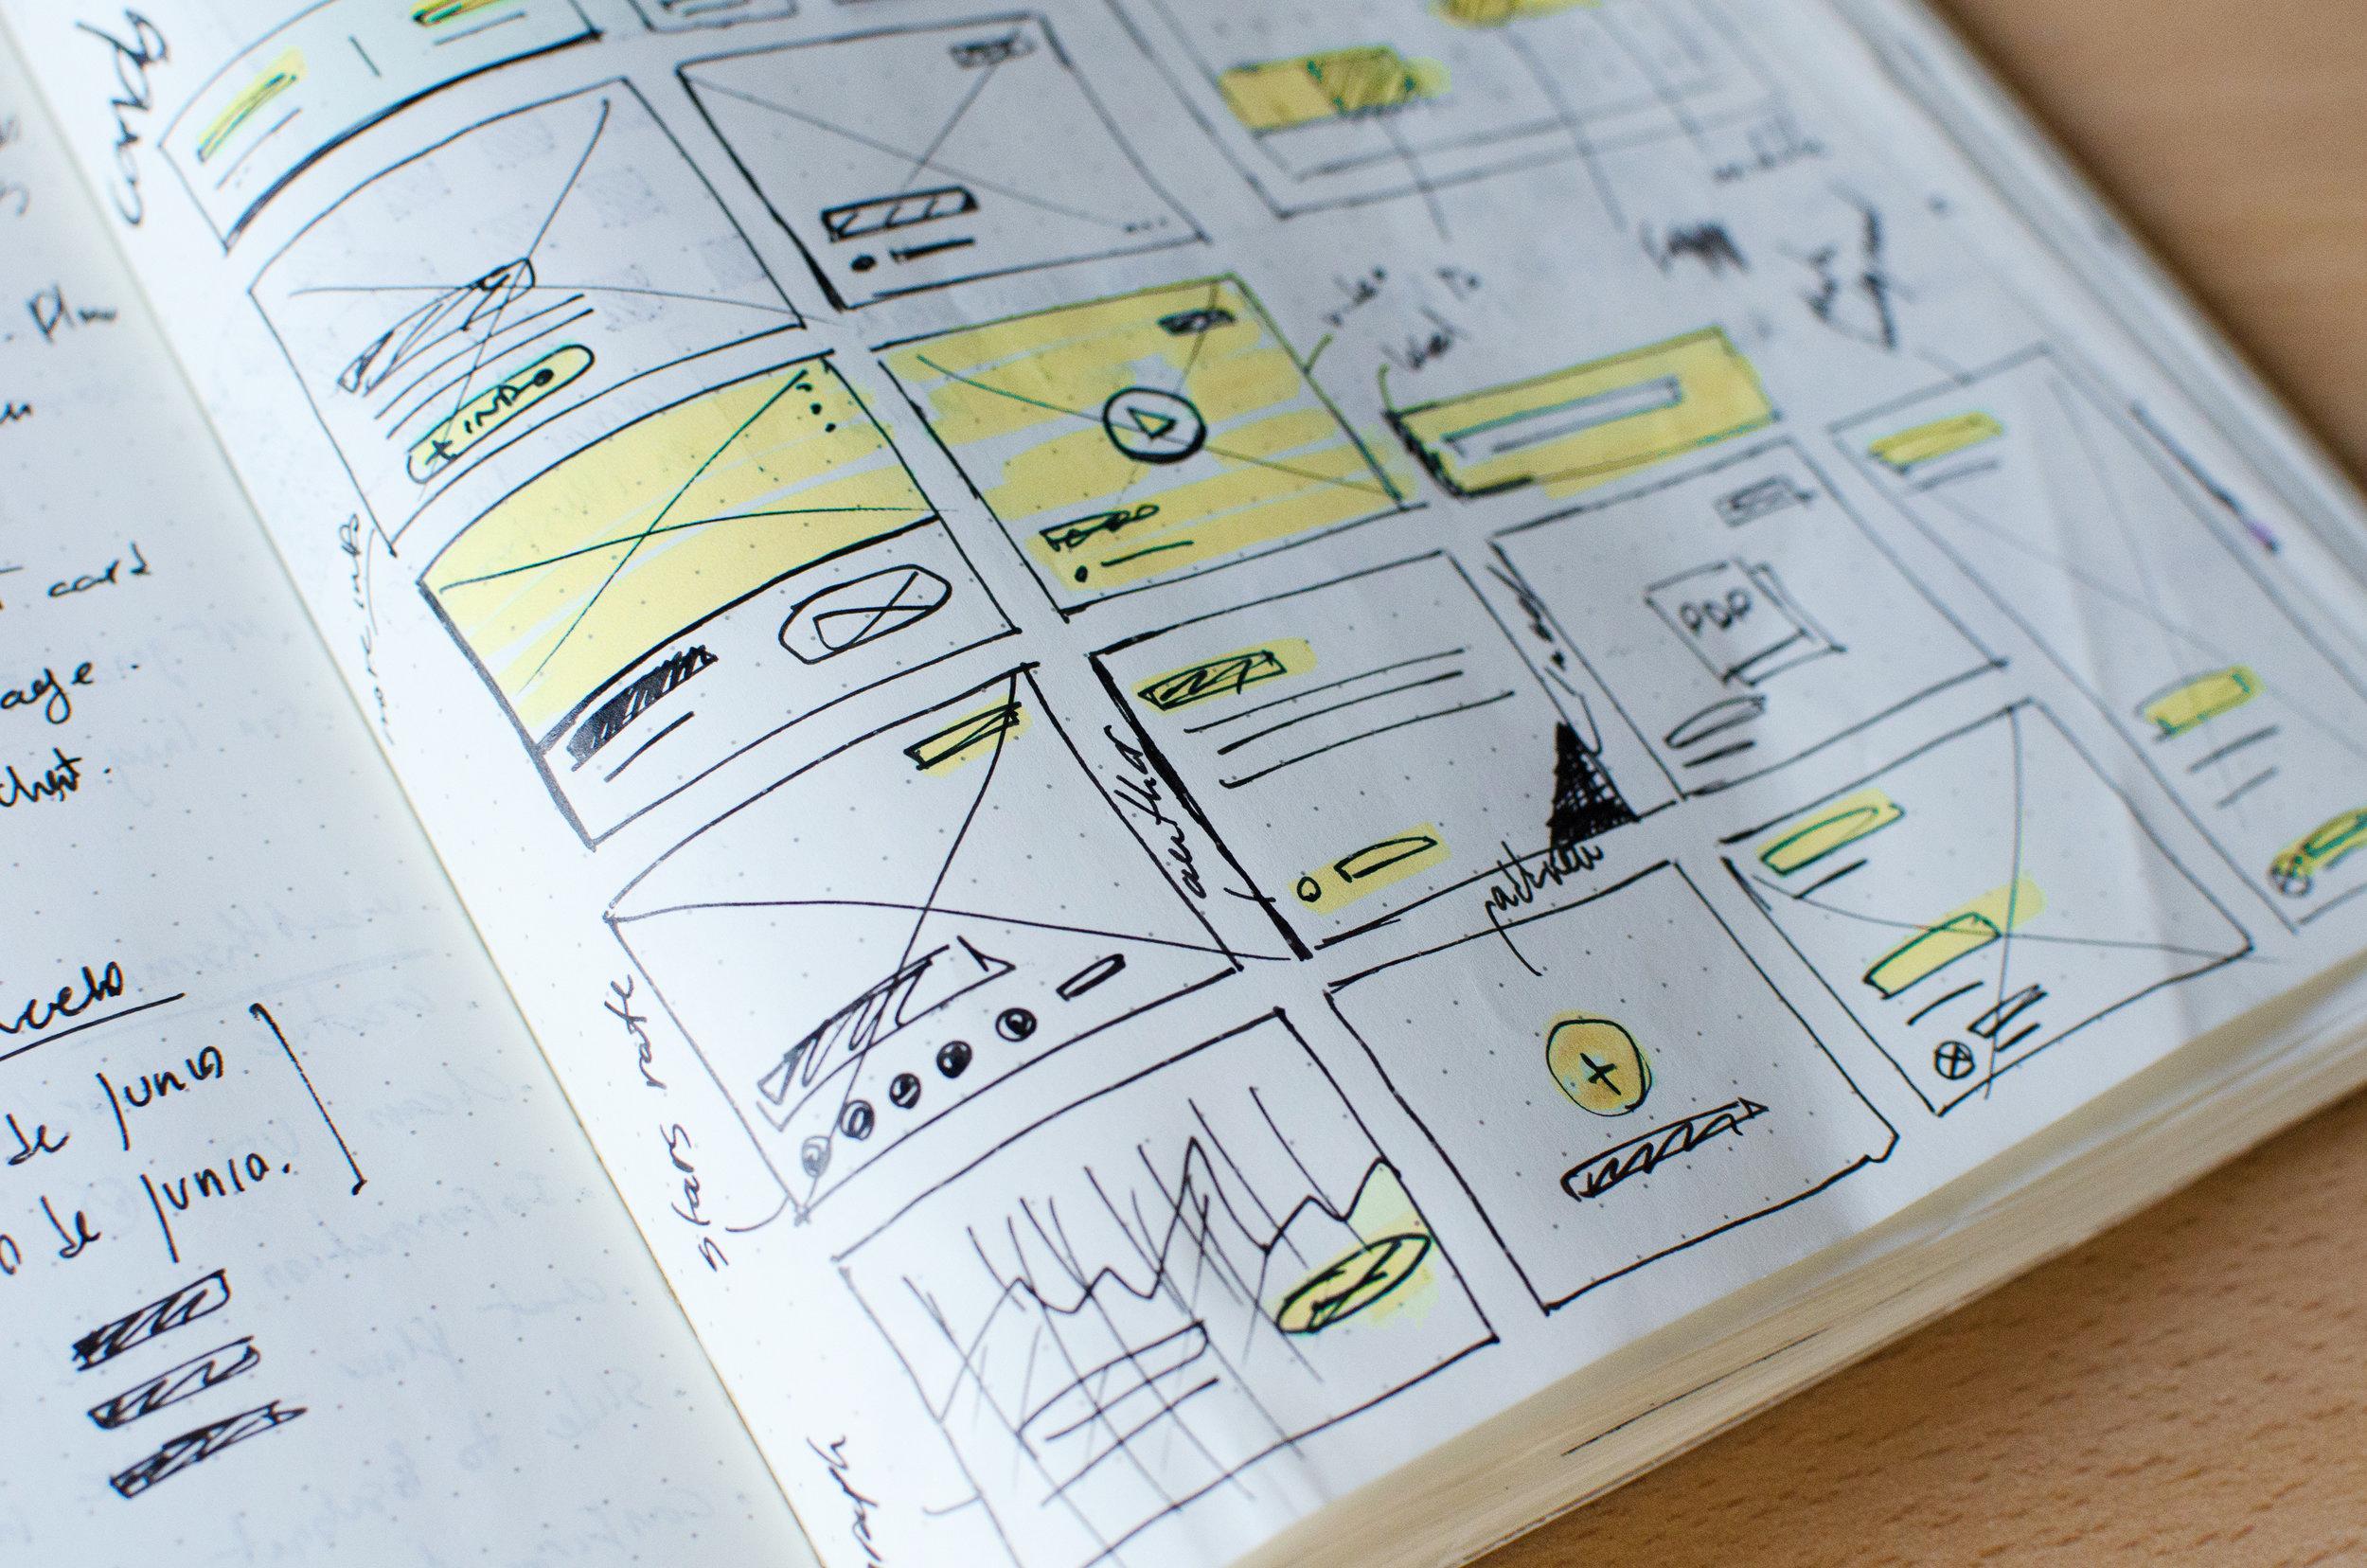 Wireframes  of website in notebook - ux